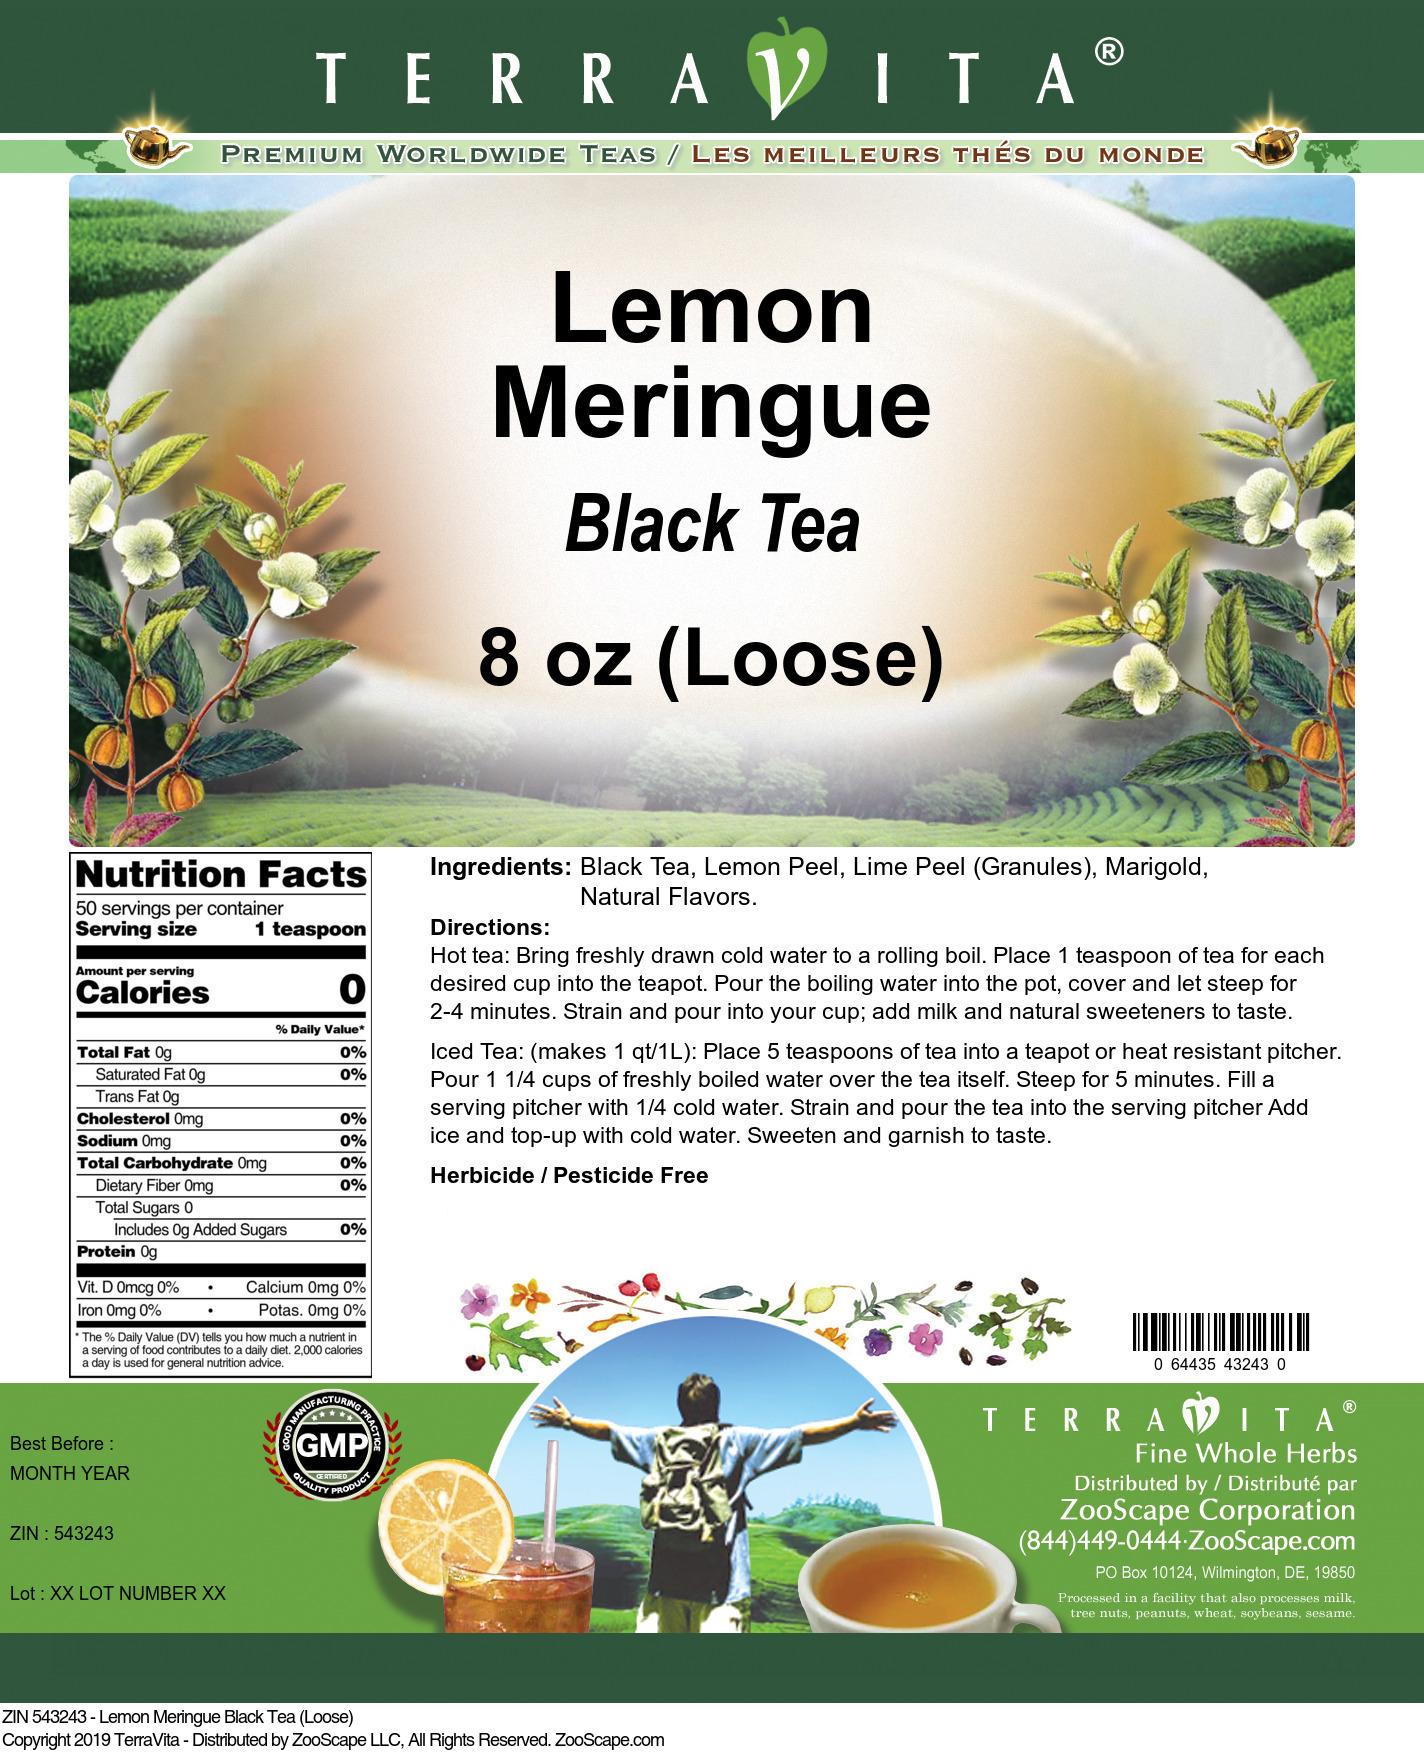 Lemon Meringue Black Tea (Loose)